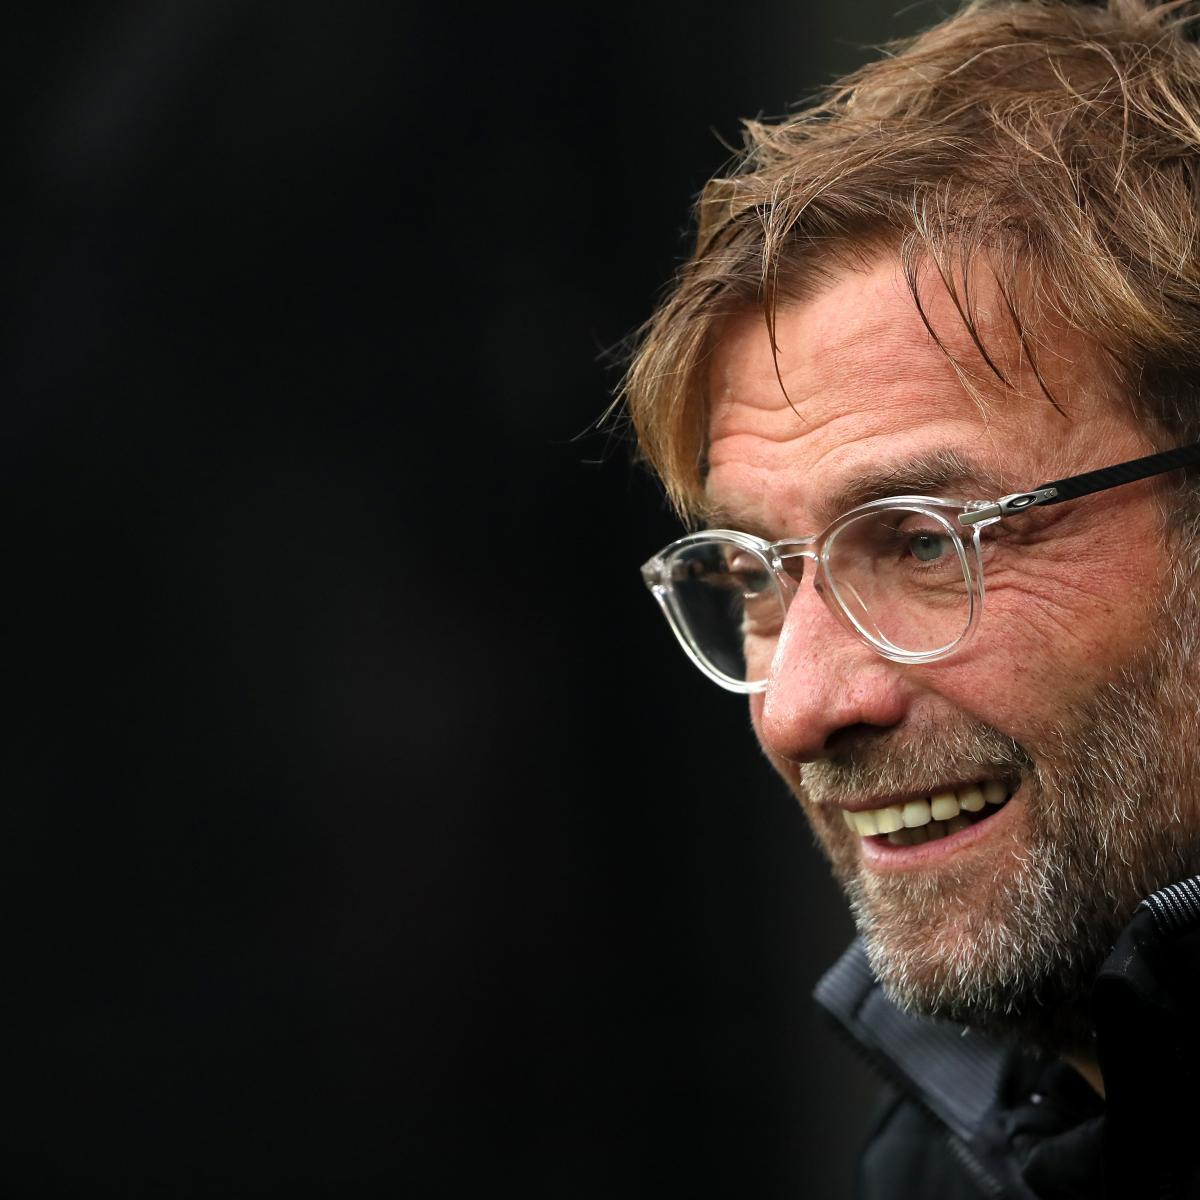 Liverpool 4 0 Borussia Dortmund Match Report Philippe: Jurgen Klopp 'Ready' To Take Charge Of Bayern Munich, Says